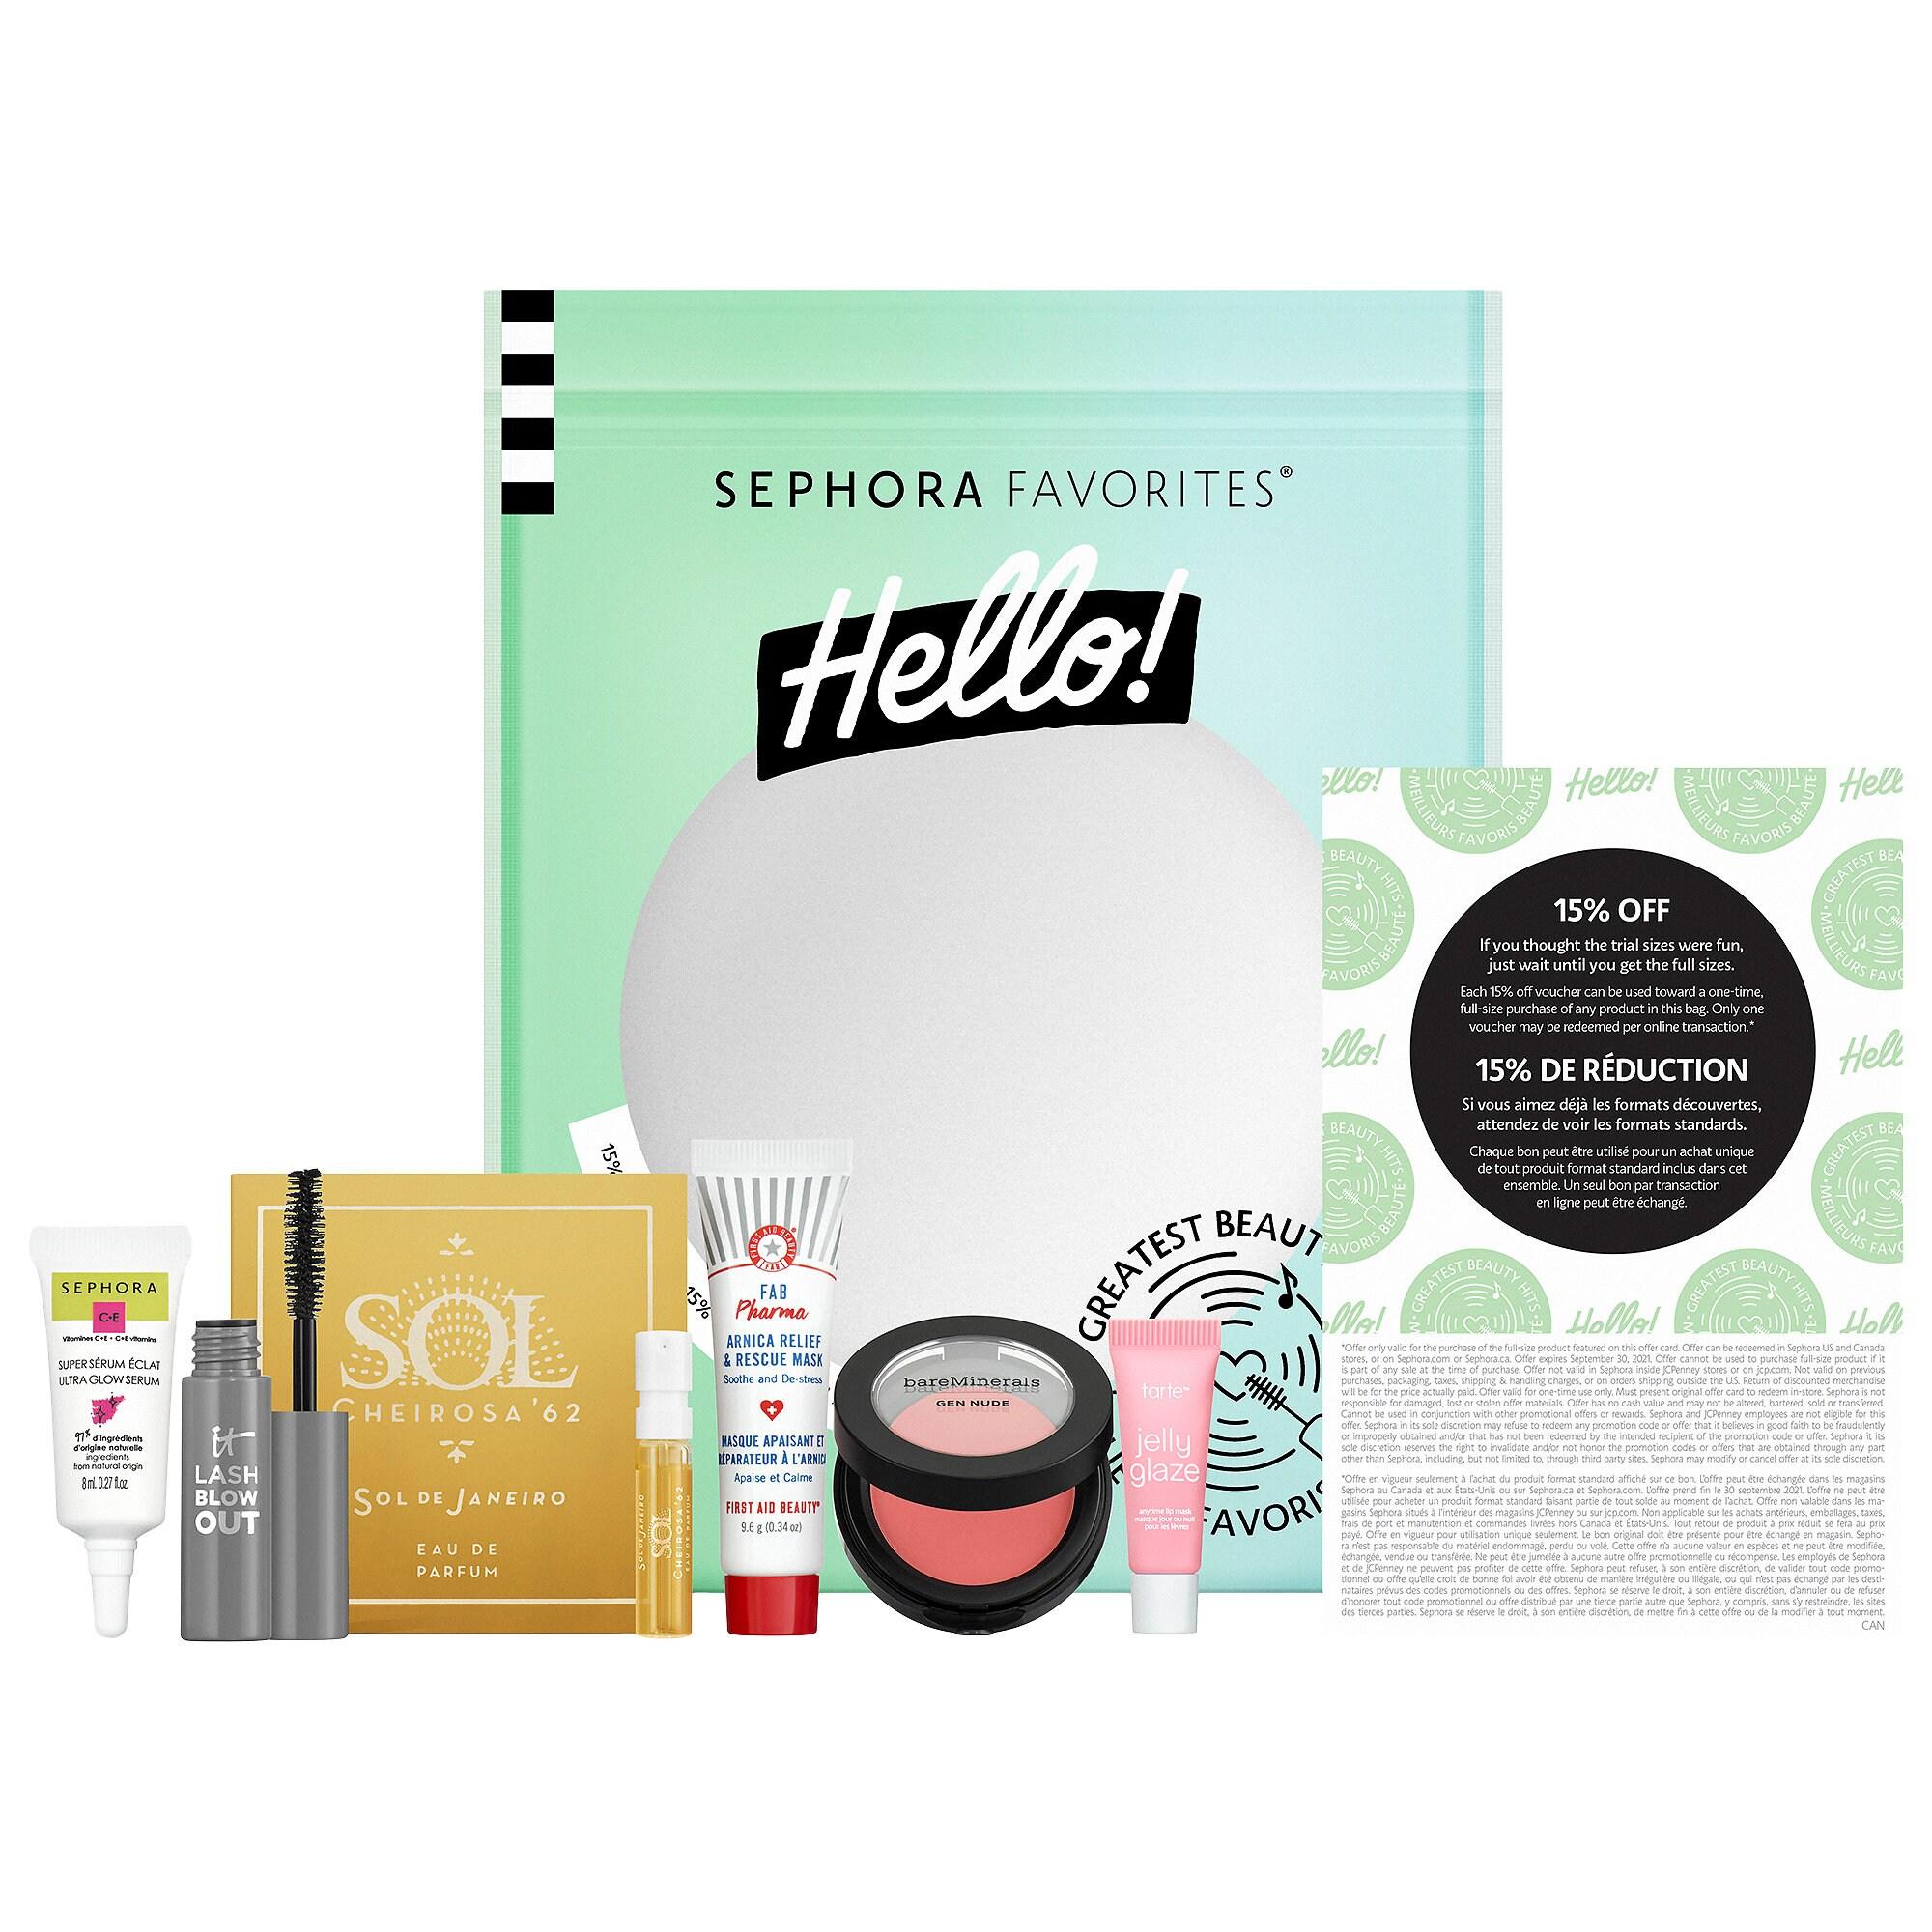 Sephora - Sephora Favorites Hello! Greatest Beauty Hits